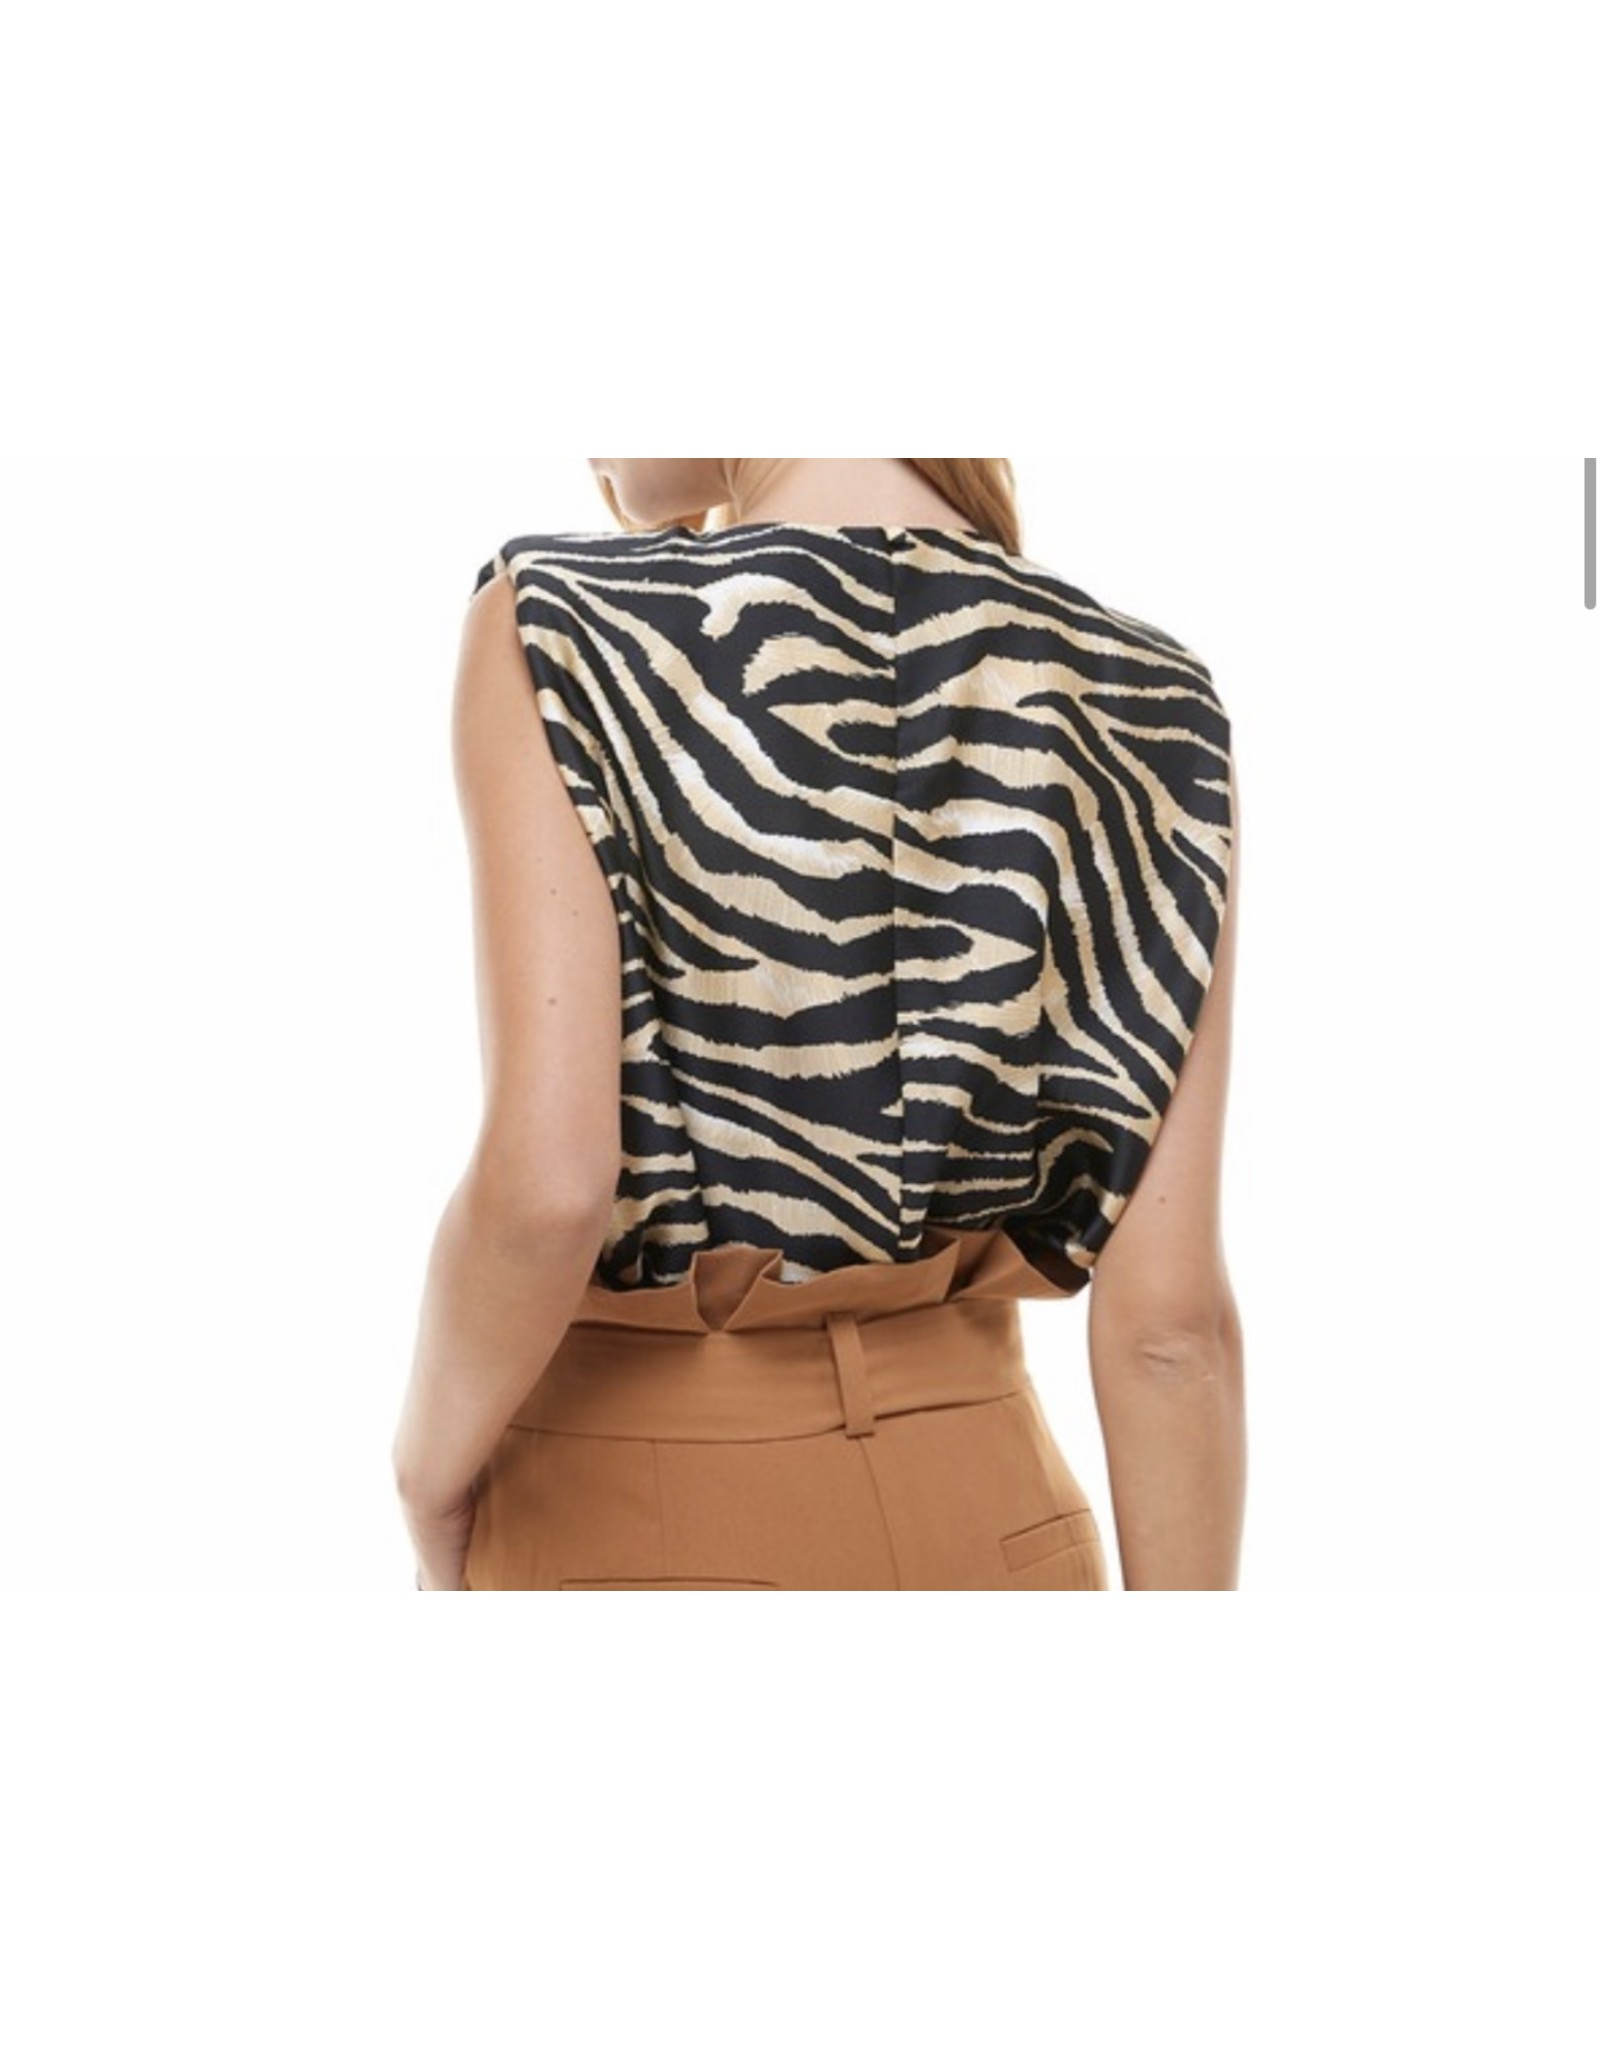 Zebra Shoulders Pads Top - Black